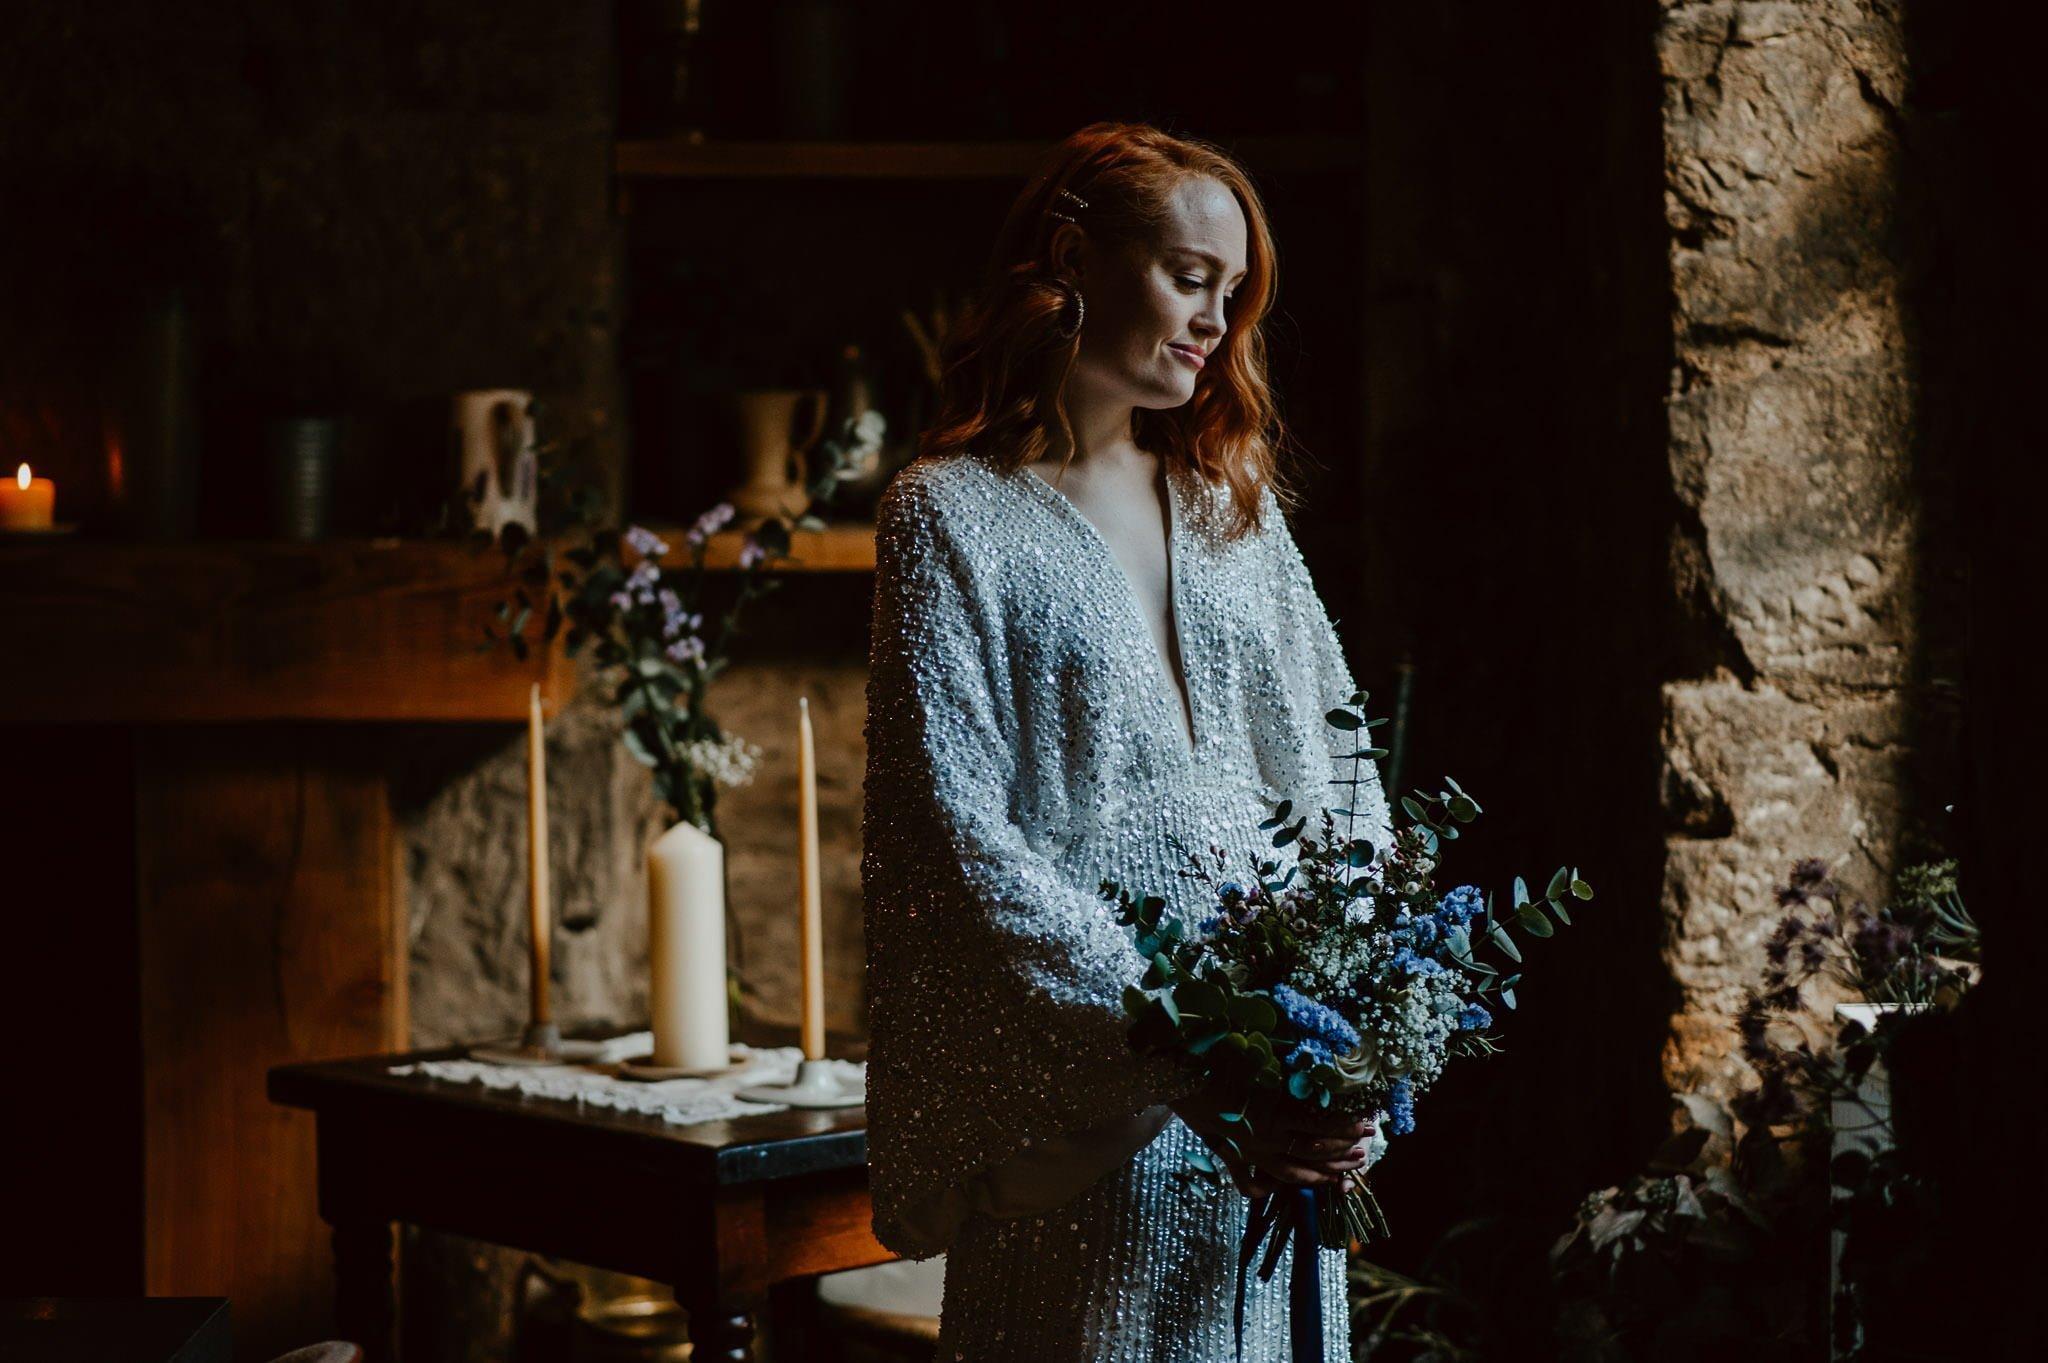 A Dreamy Pre-Raphaelite Wedding at the Bothy in Glasgow 9